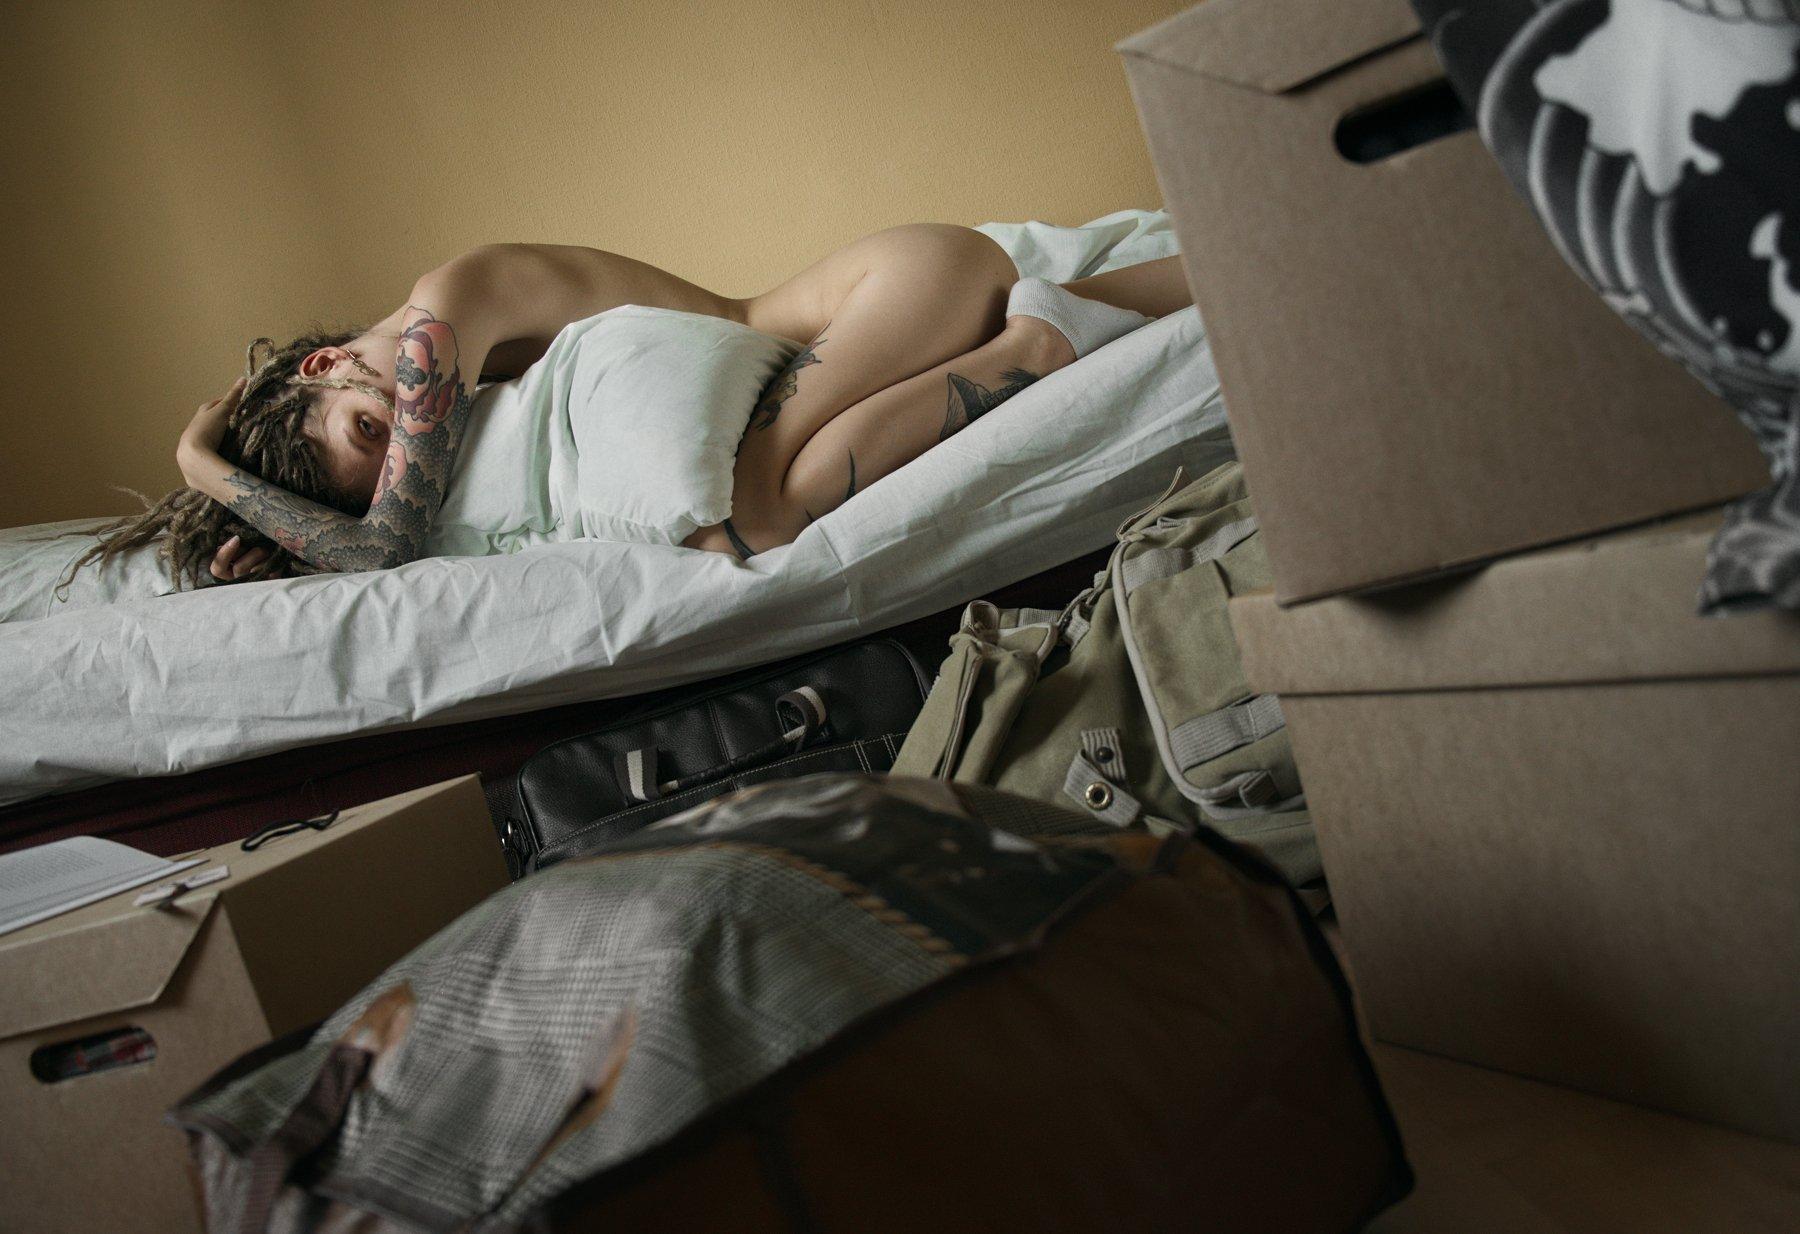 girl, nude, naked, tattoo, home, at home, fujifilmru, Роман Филиппов